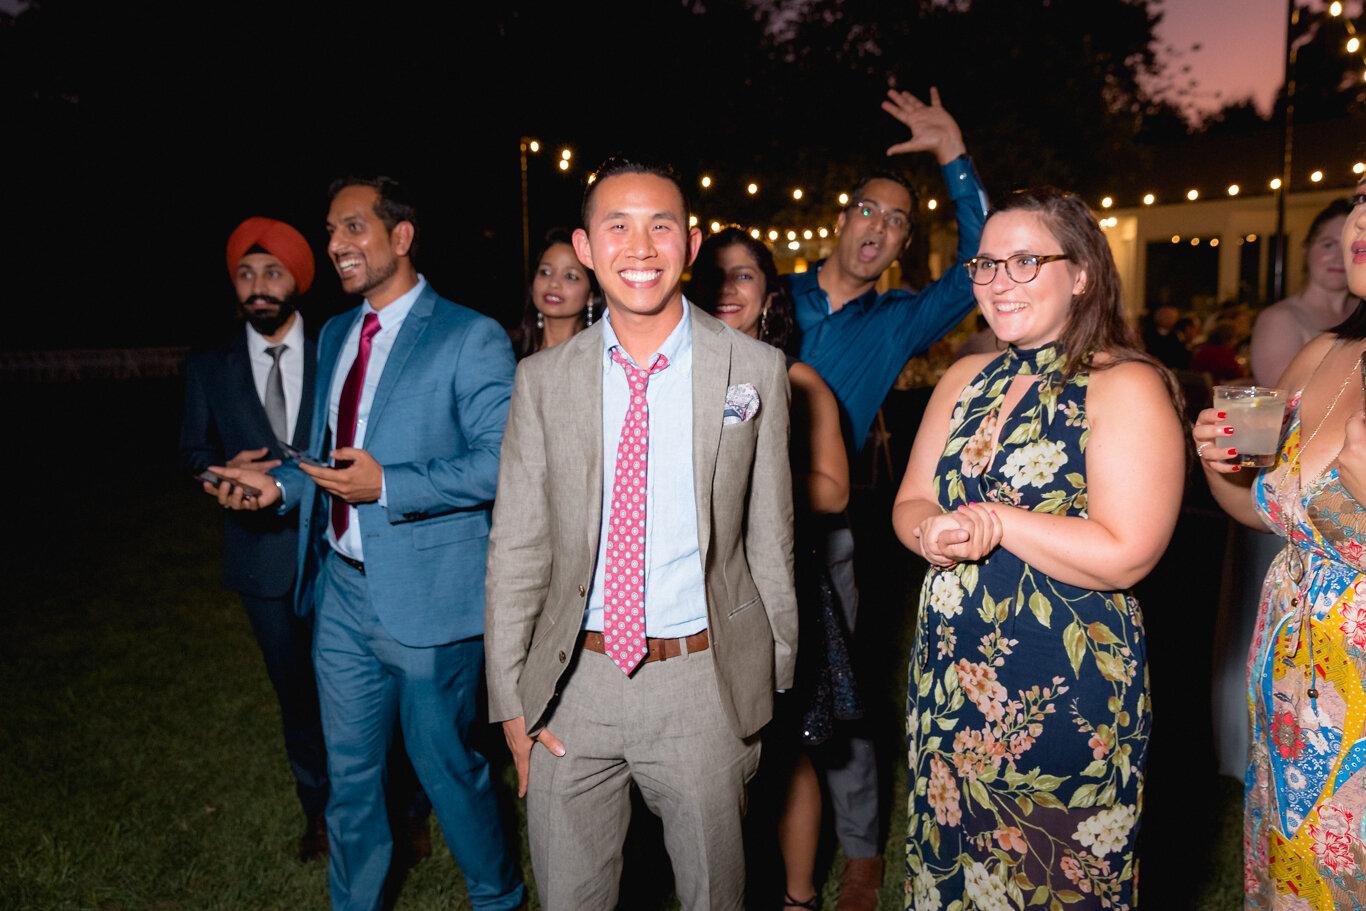 2019.08.24_Emily-Ashir-Wedding-at-the-Maples-6386.jpg